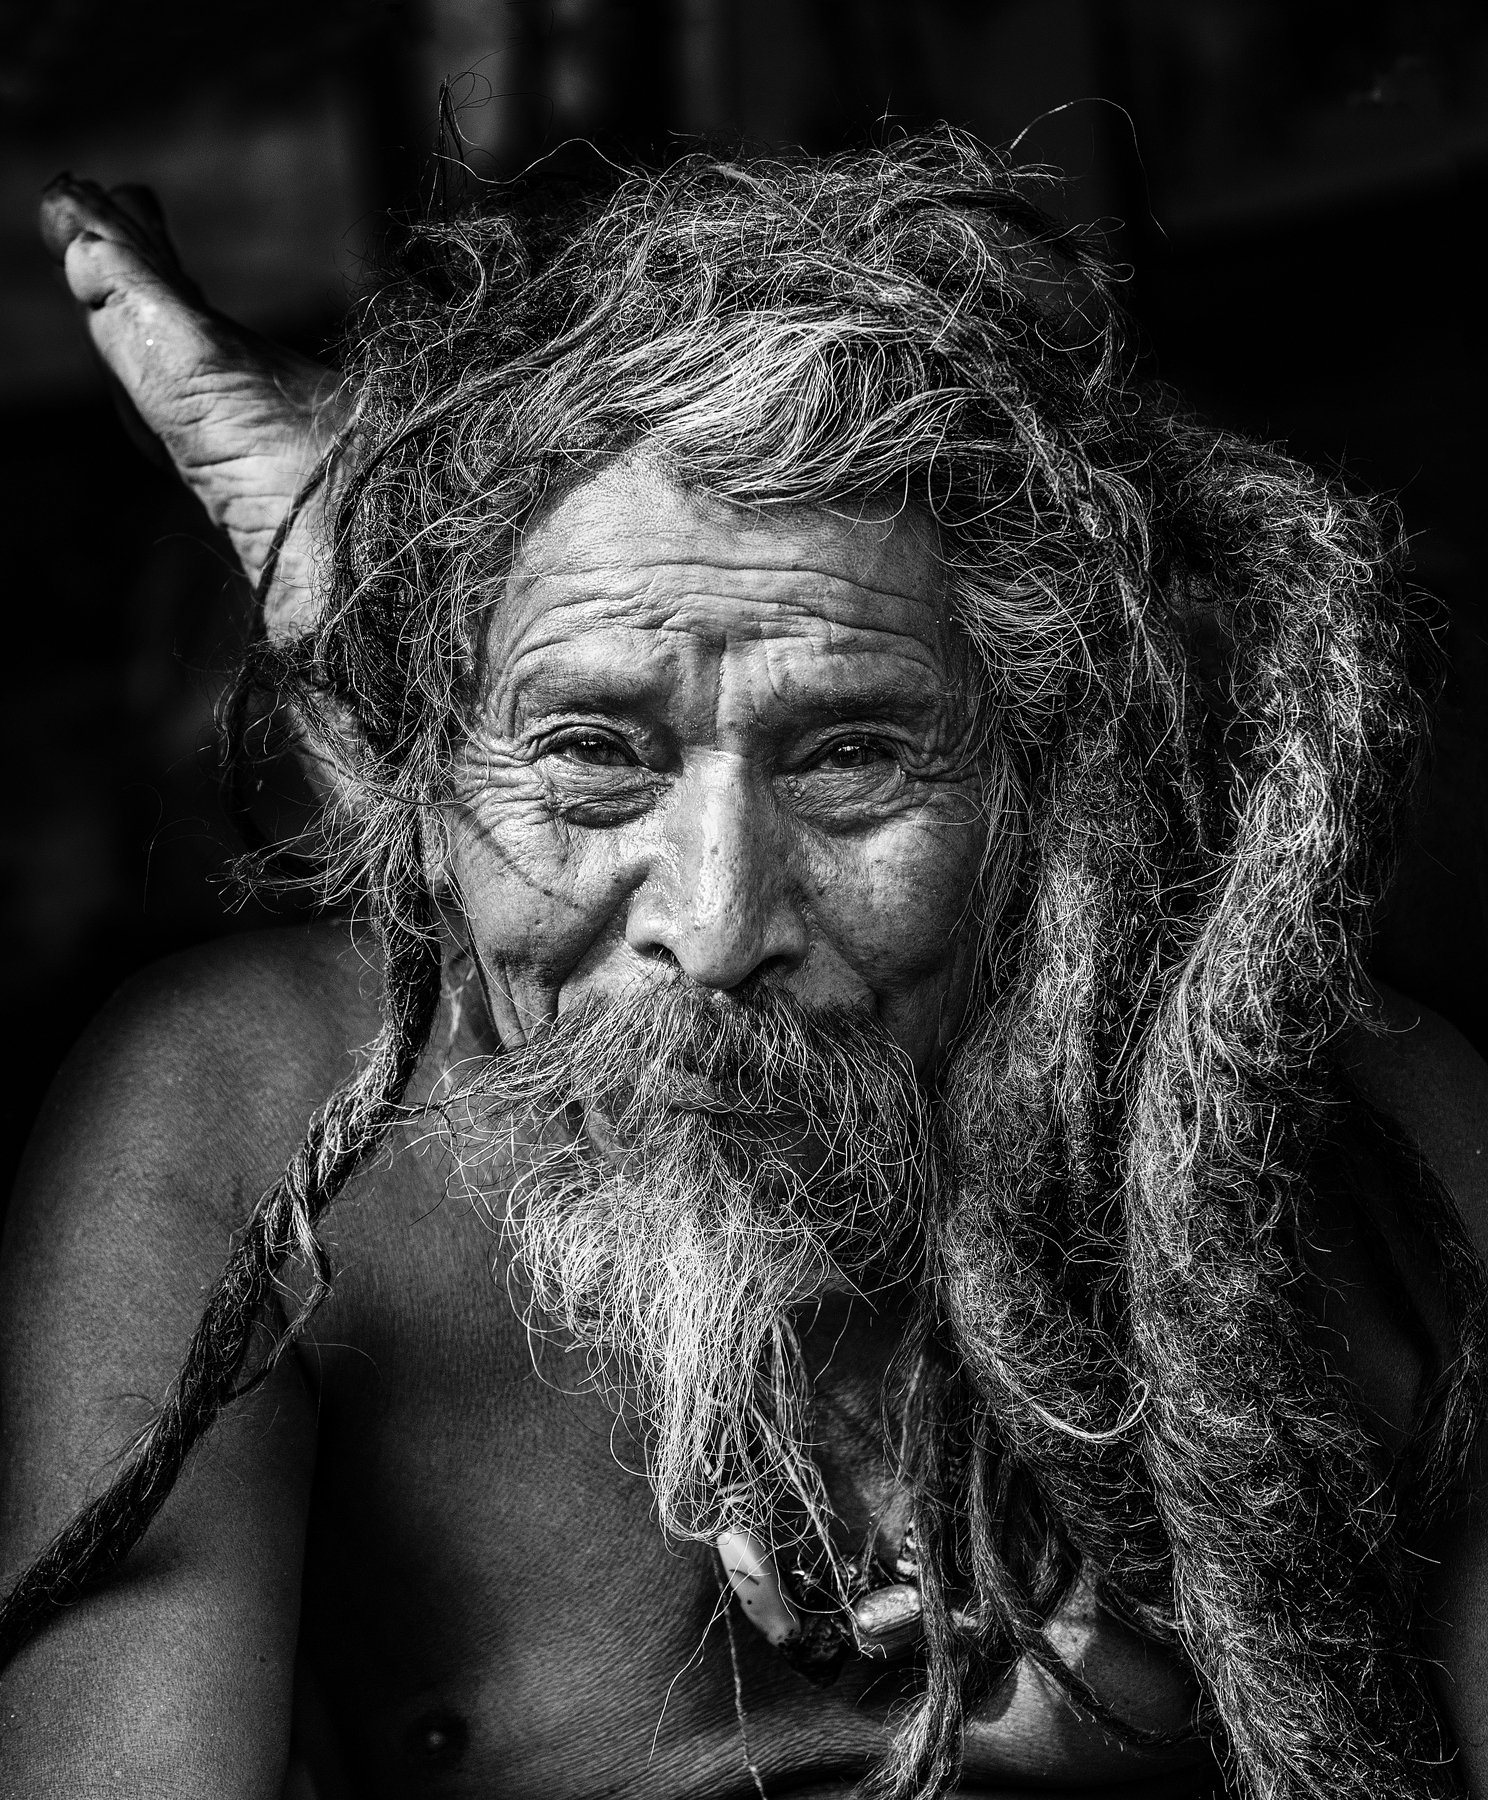 Непал, Гималаи, йог, Алексей Сулоев